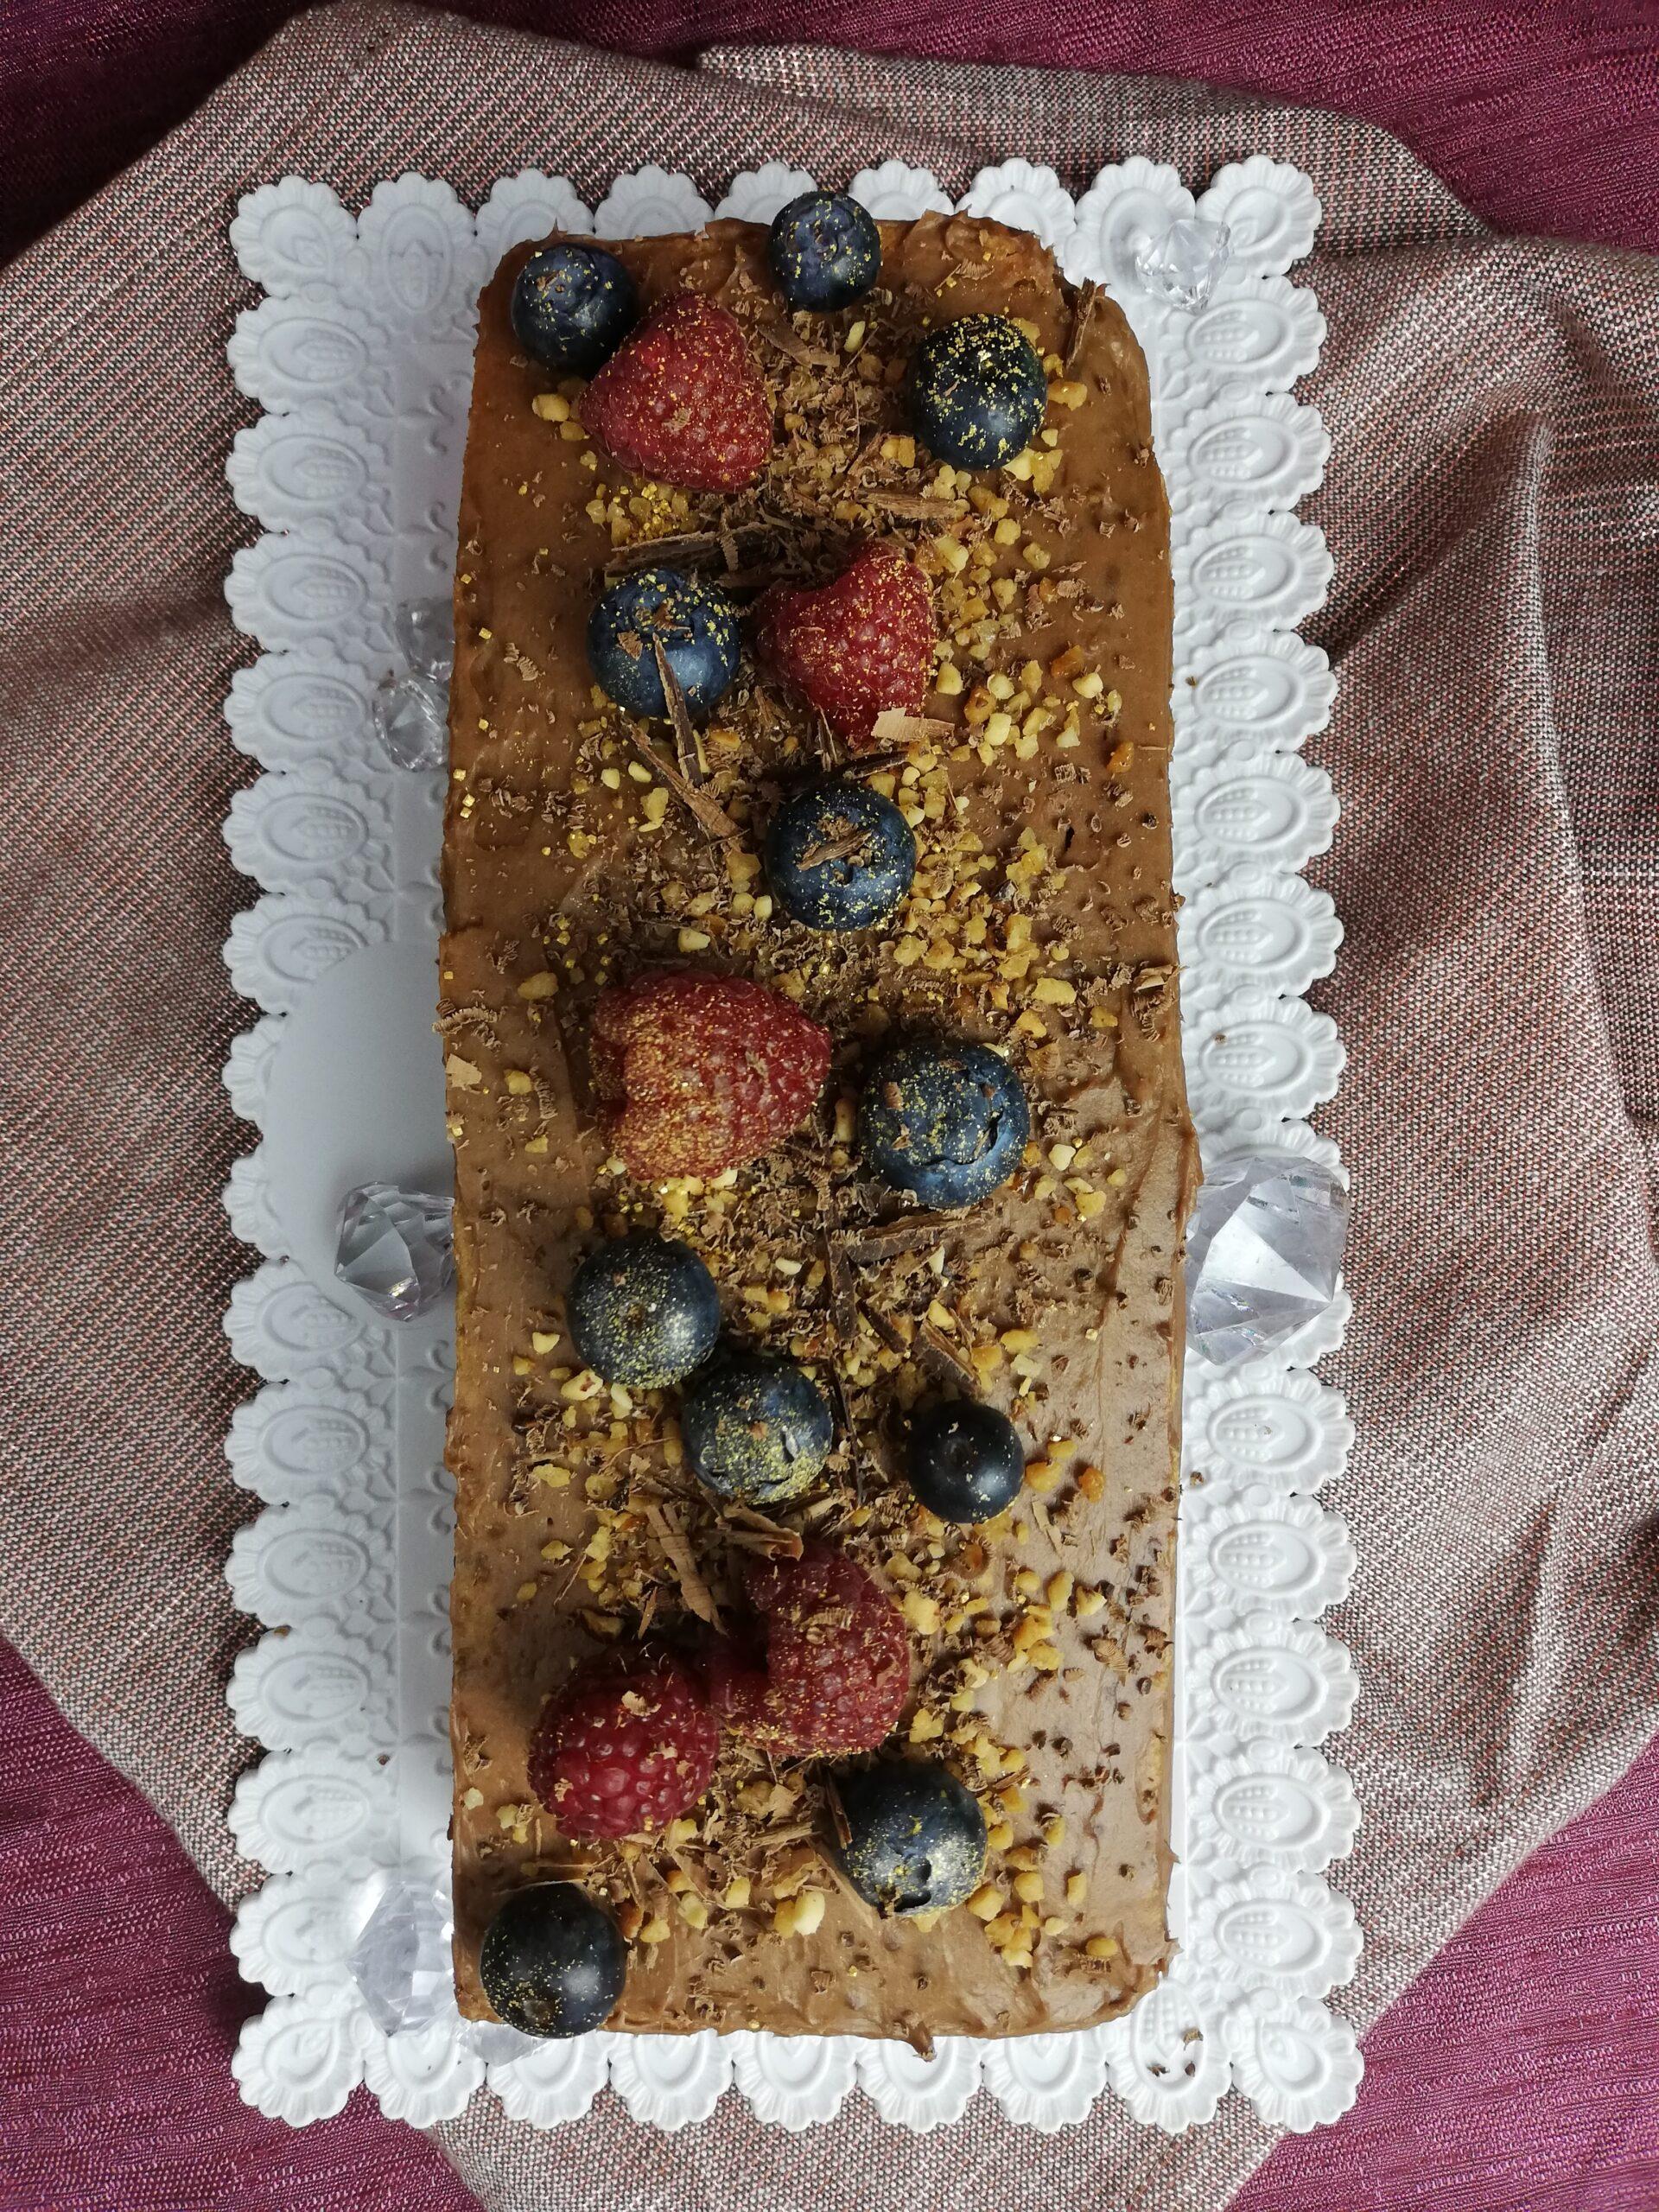 Smooth Walnut Cake With Fruits